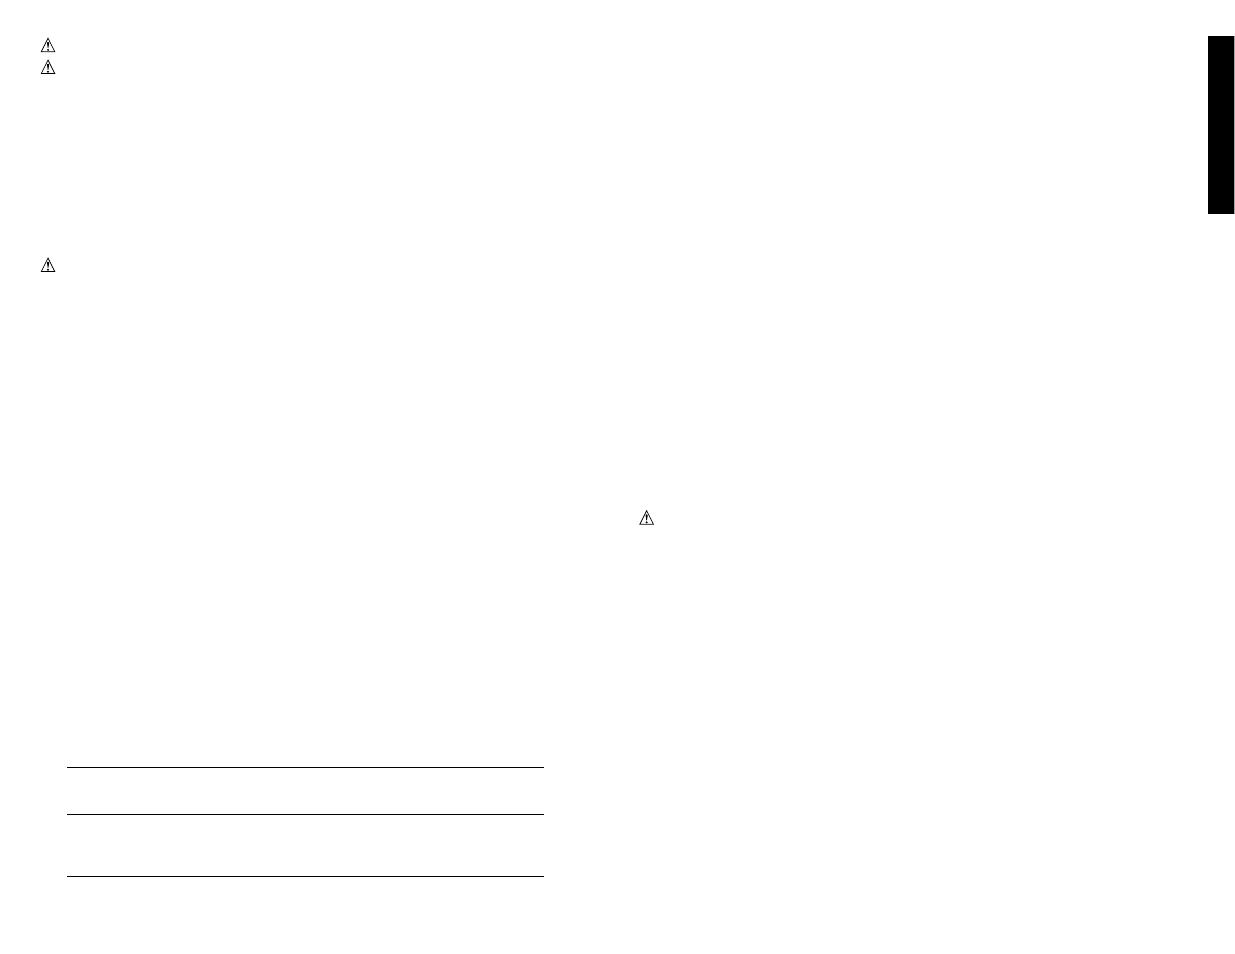 double insulation polarized plugs important safety instructions rh manualsdir com De Walt DW746 dewalt dw744 owners manual